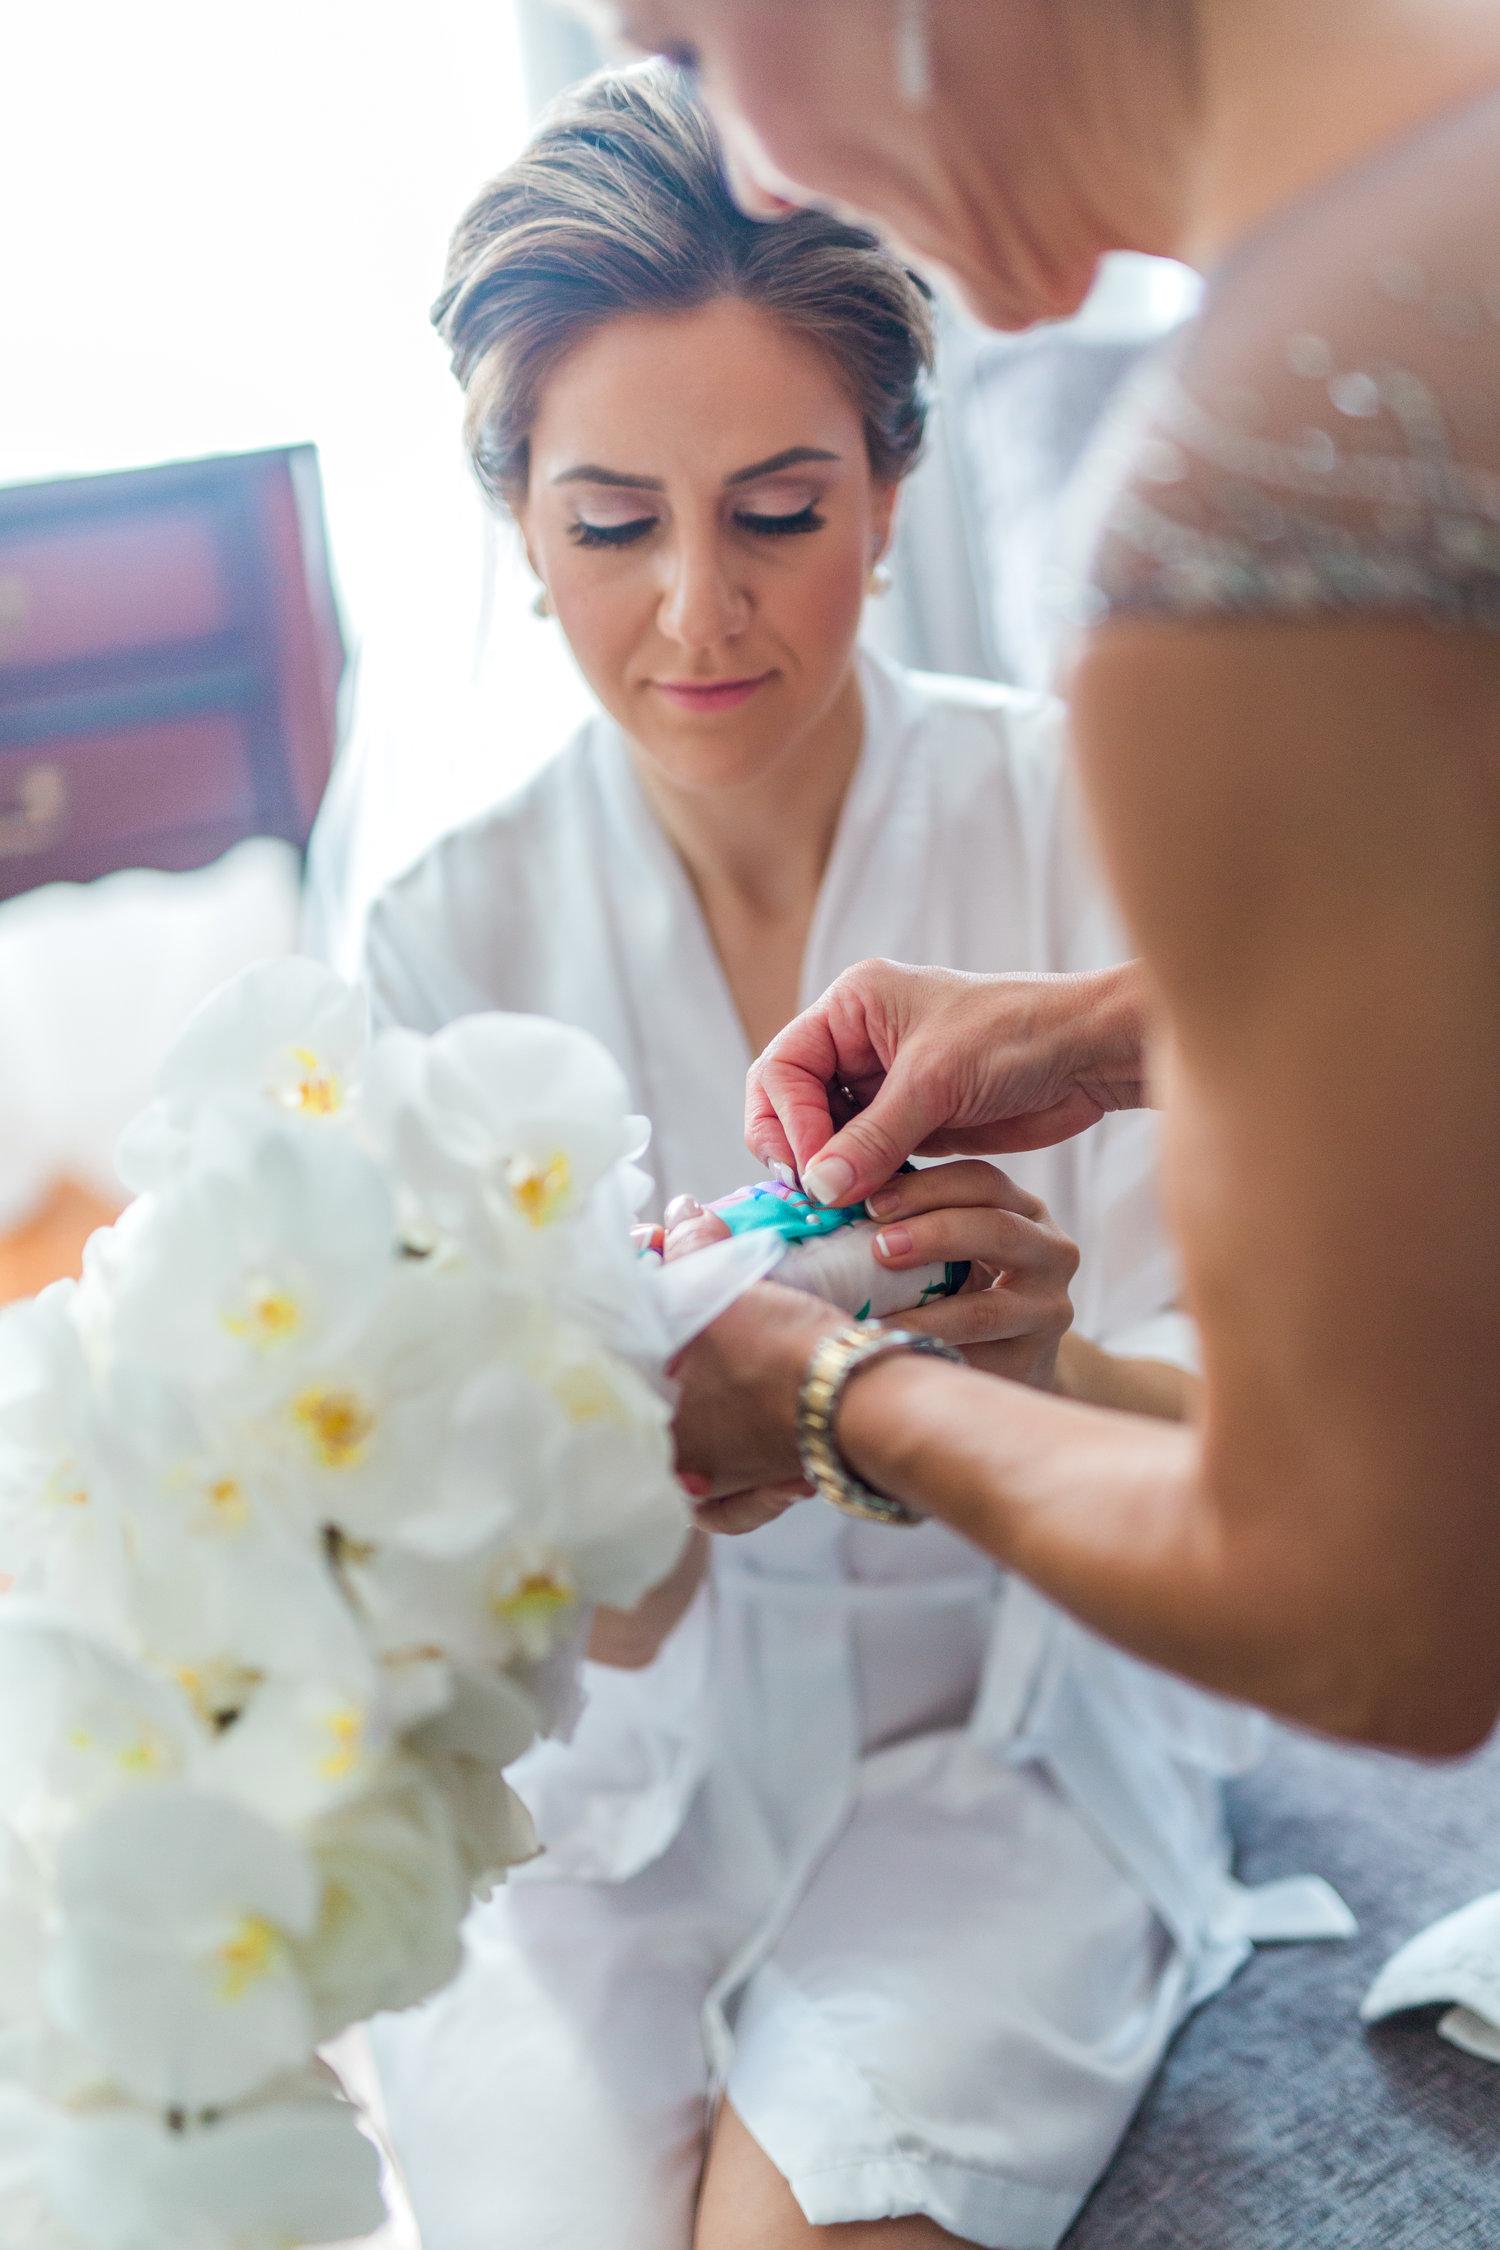 Danielle-Giroux-Amir-Golbazi-Toronto-Wedding-Photographer-Bellvue-Manor_DeLuca_1-122.jpg